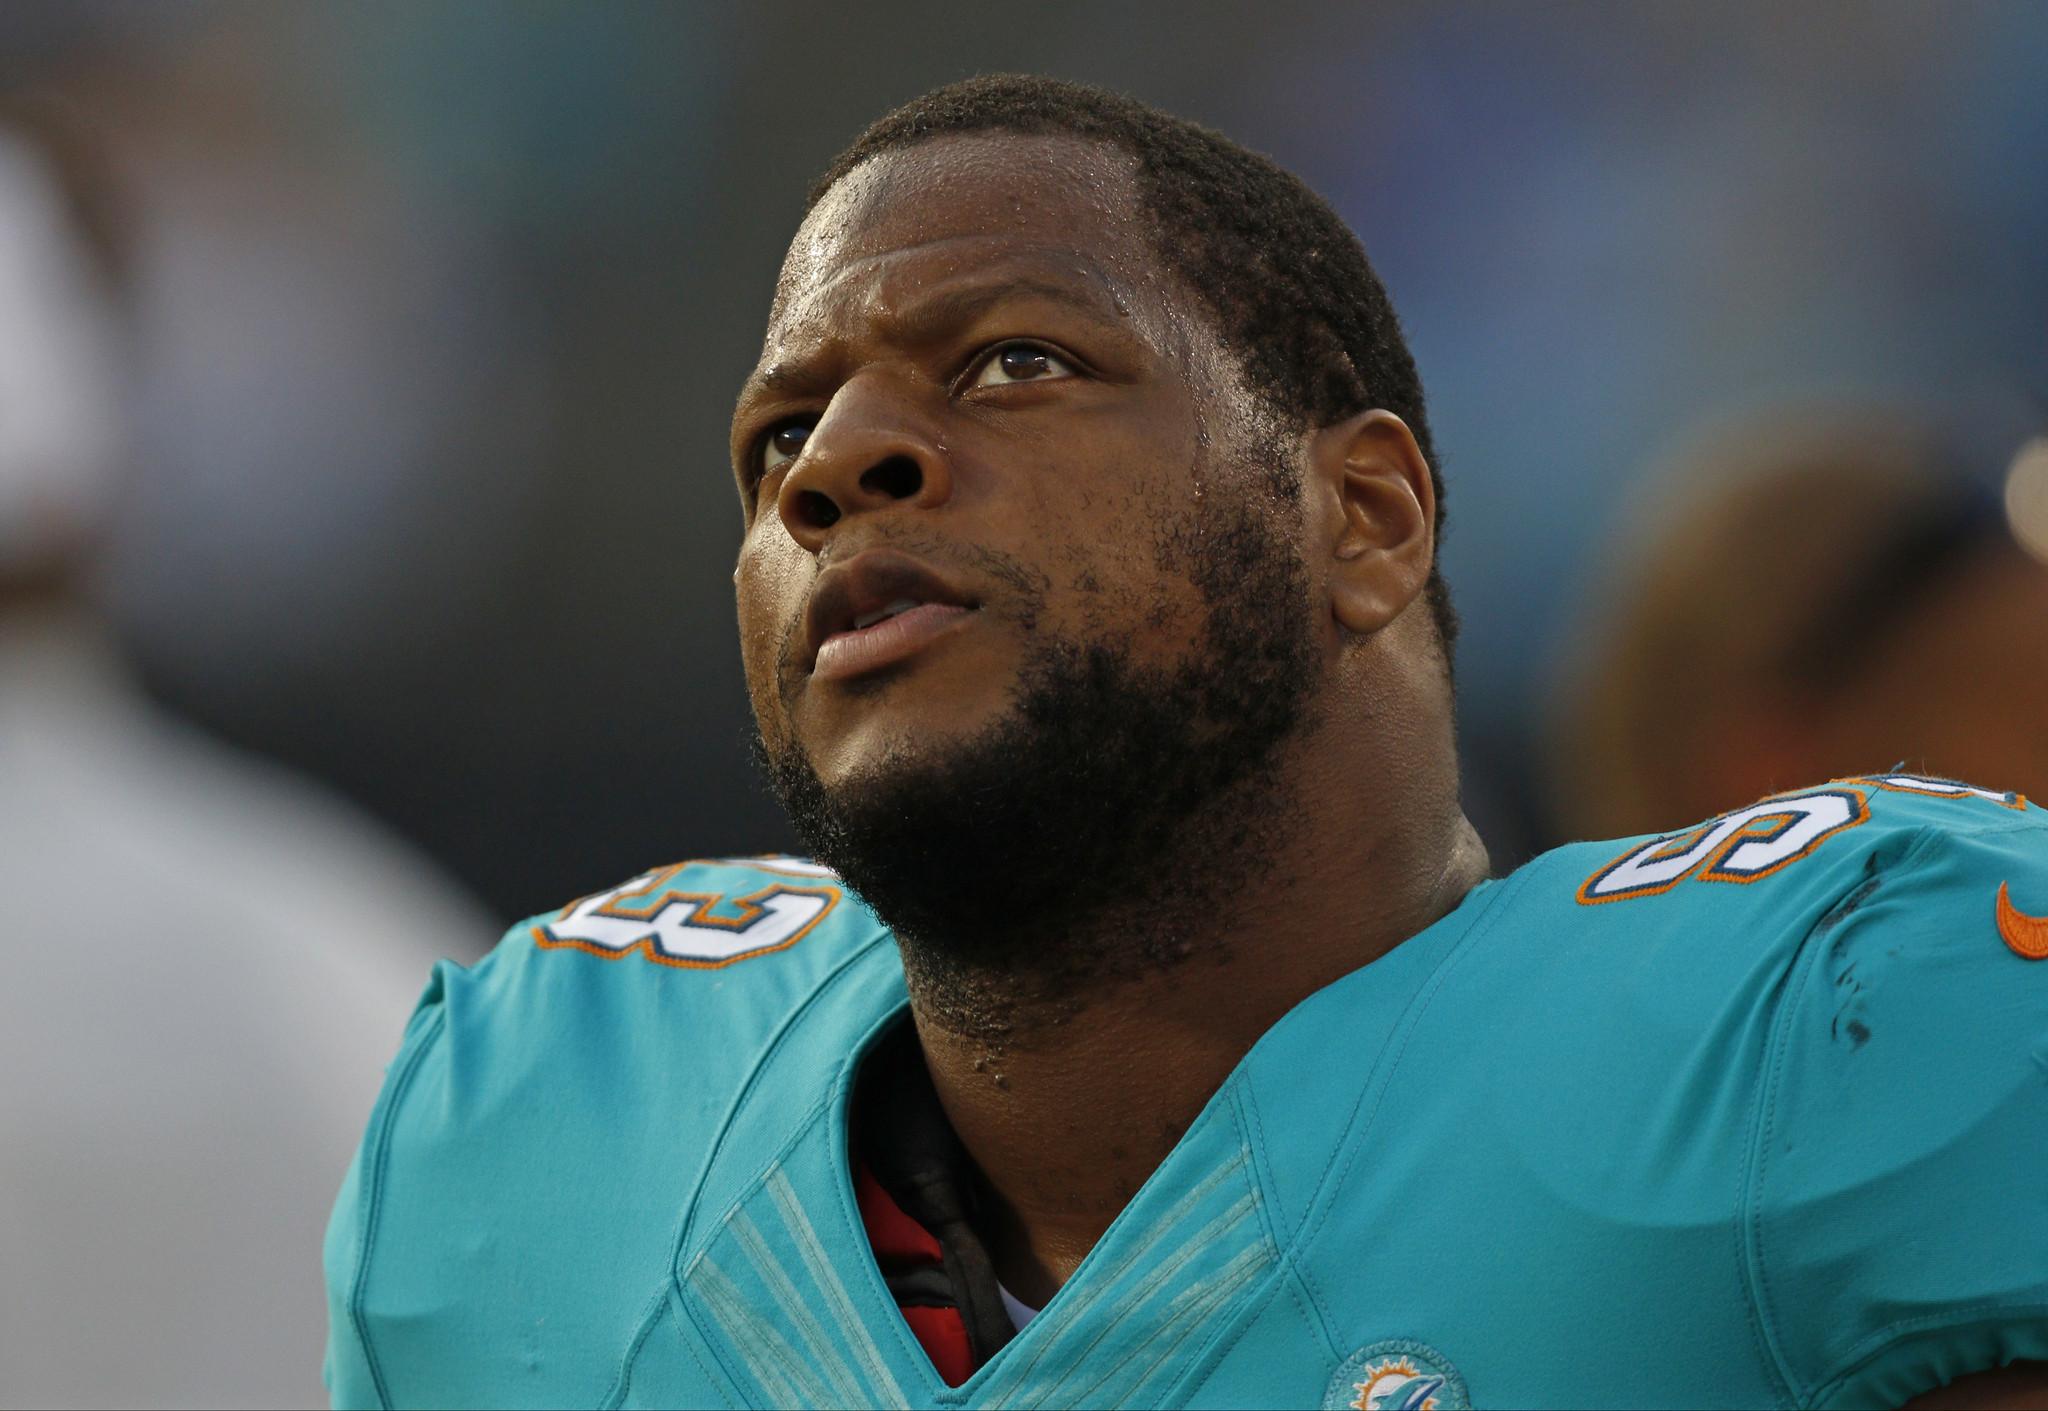 NFL star Ndamukong Suh drops $6 5 million on flashy Florida